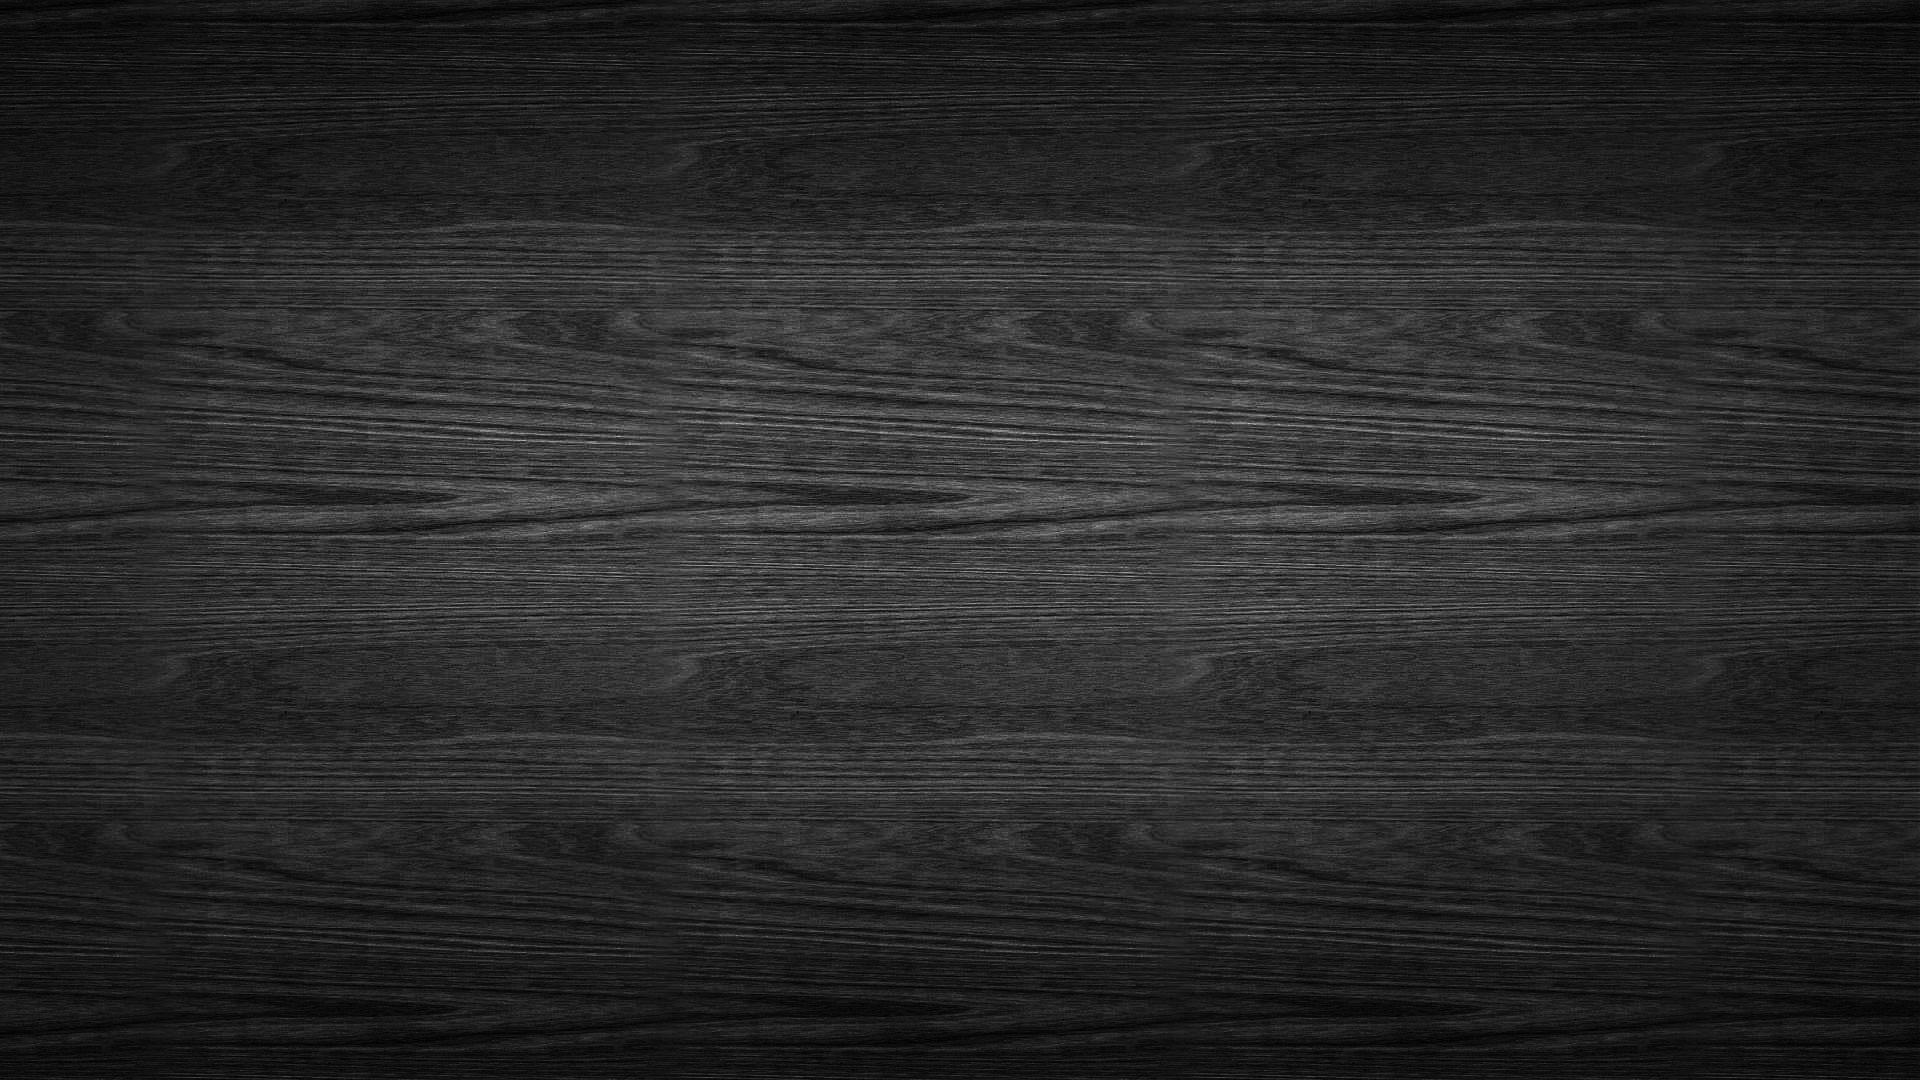 black woodgrain wallpaper wallpapersafari. Black Bedroom Furniture Sets. Home Design Ideas